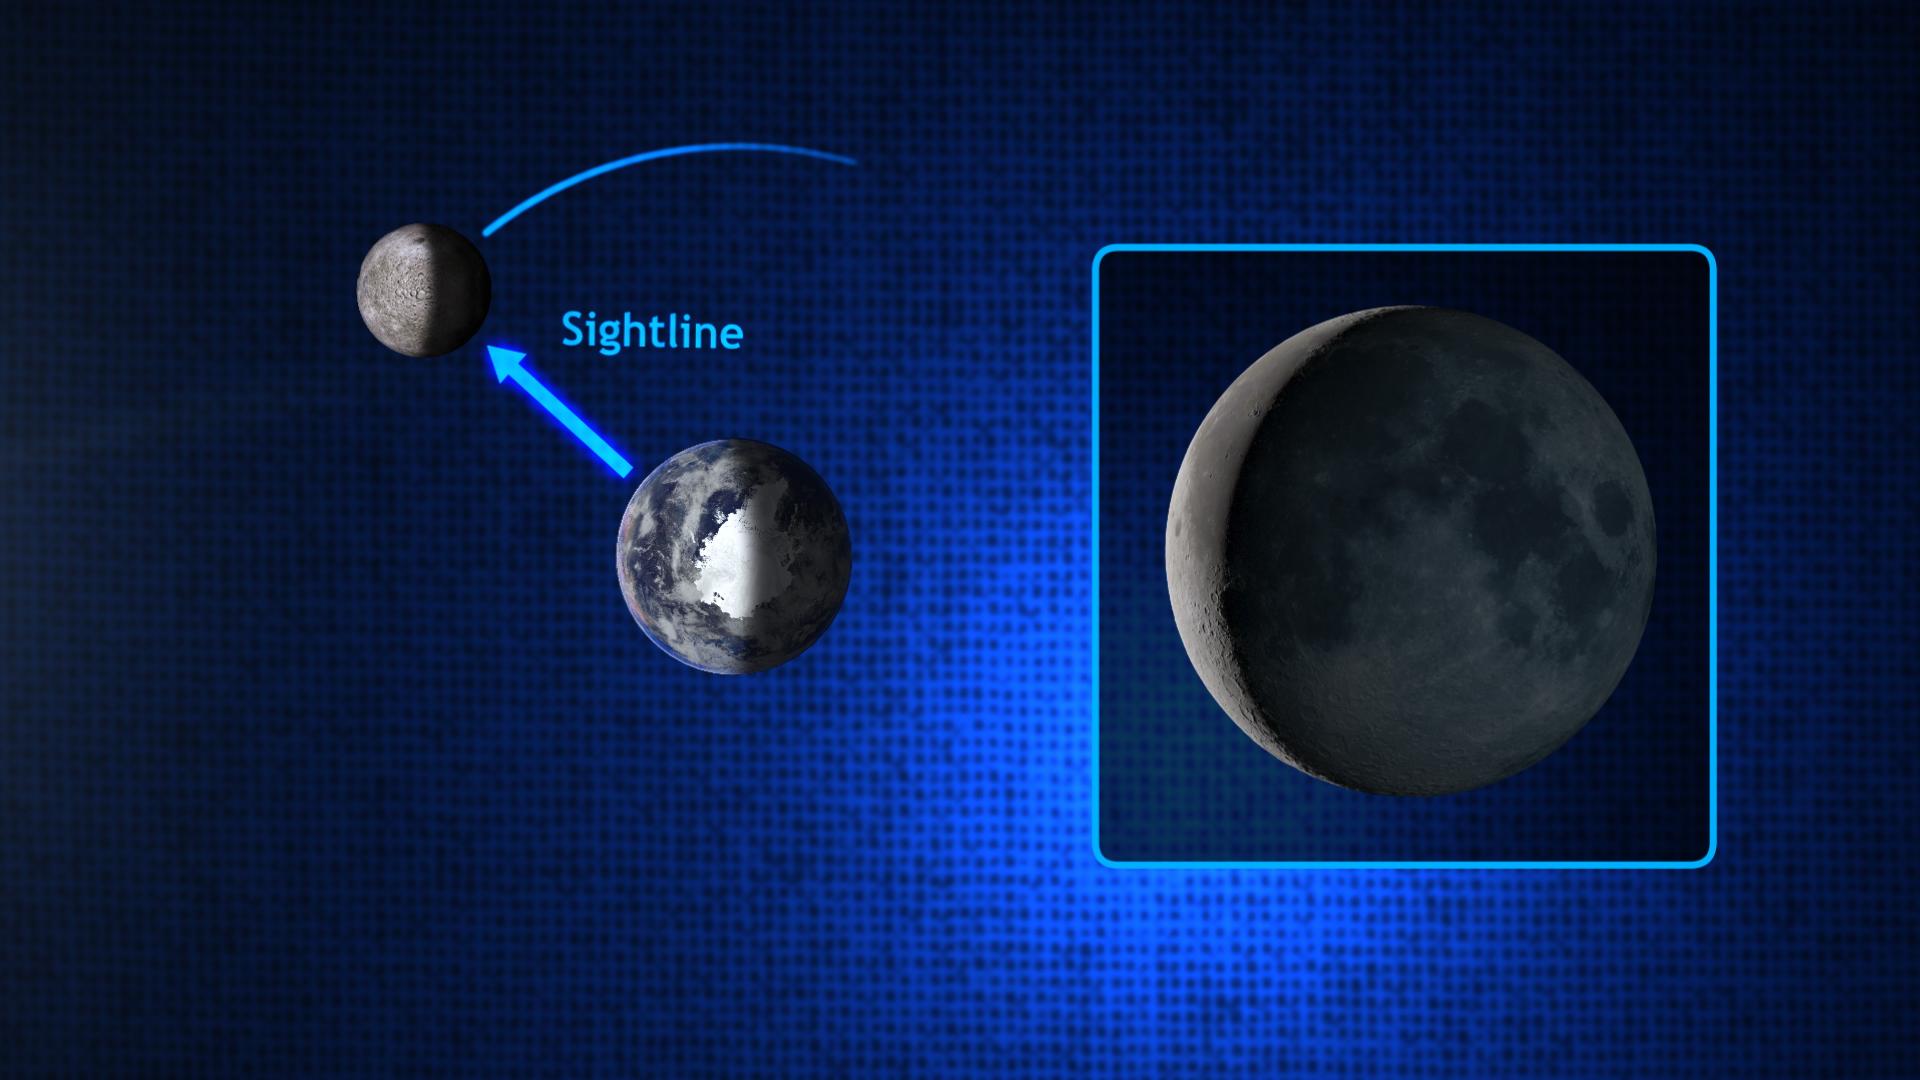 nasa lunar cycles - photo #14